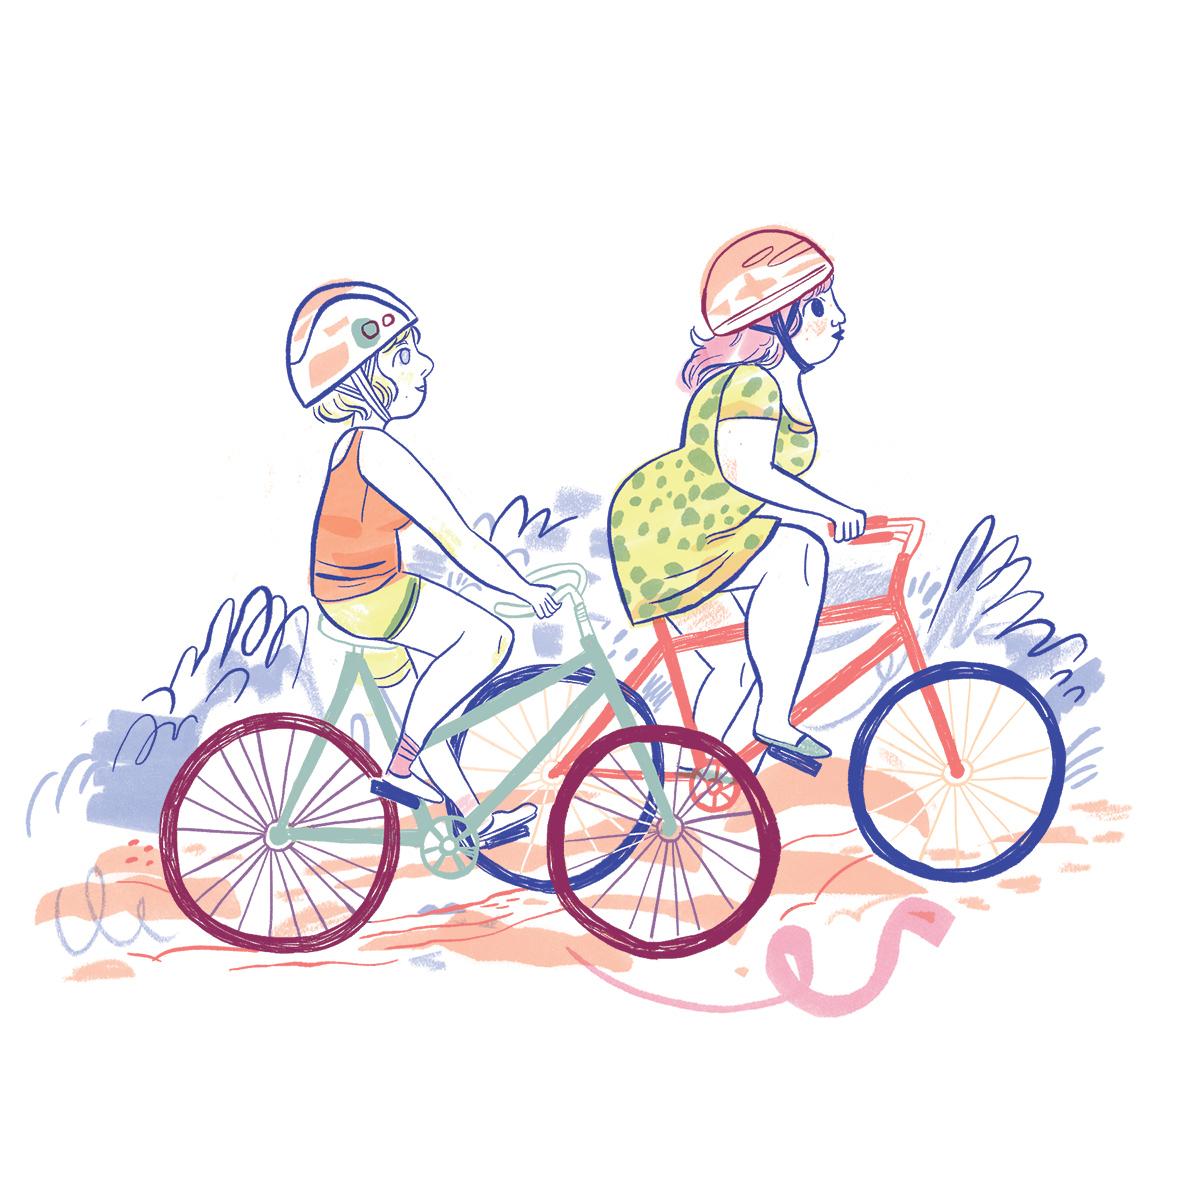 wk6_bikes.jpg